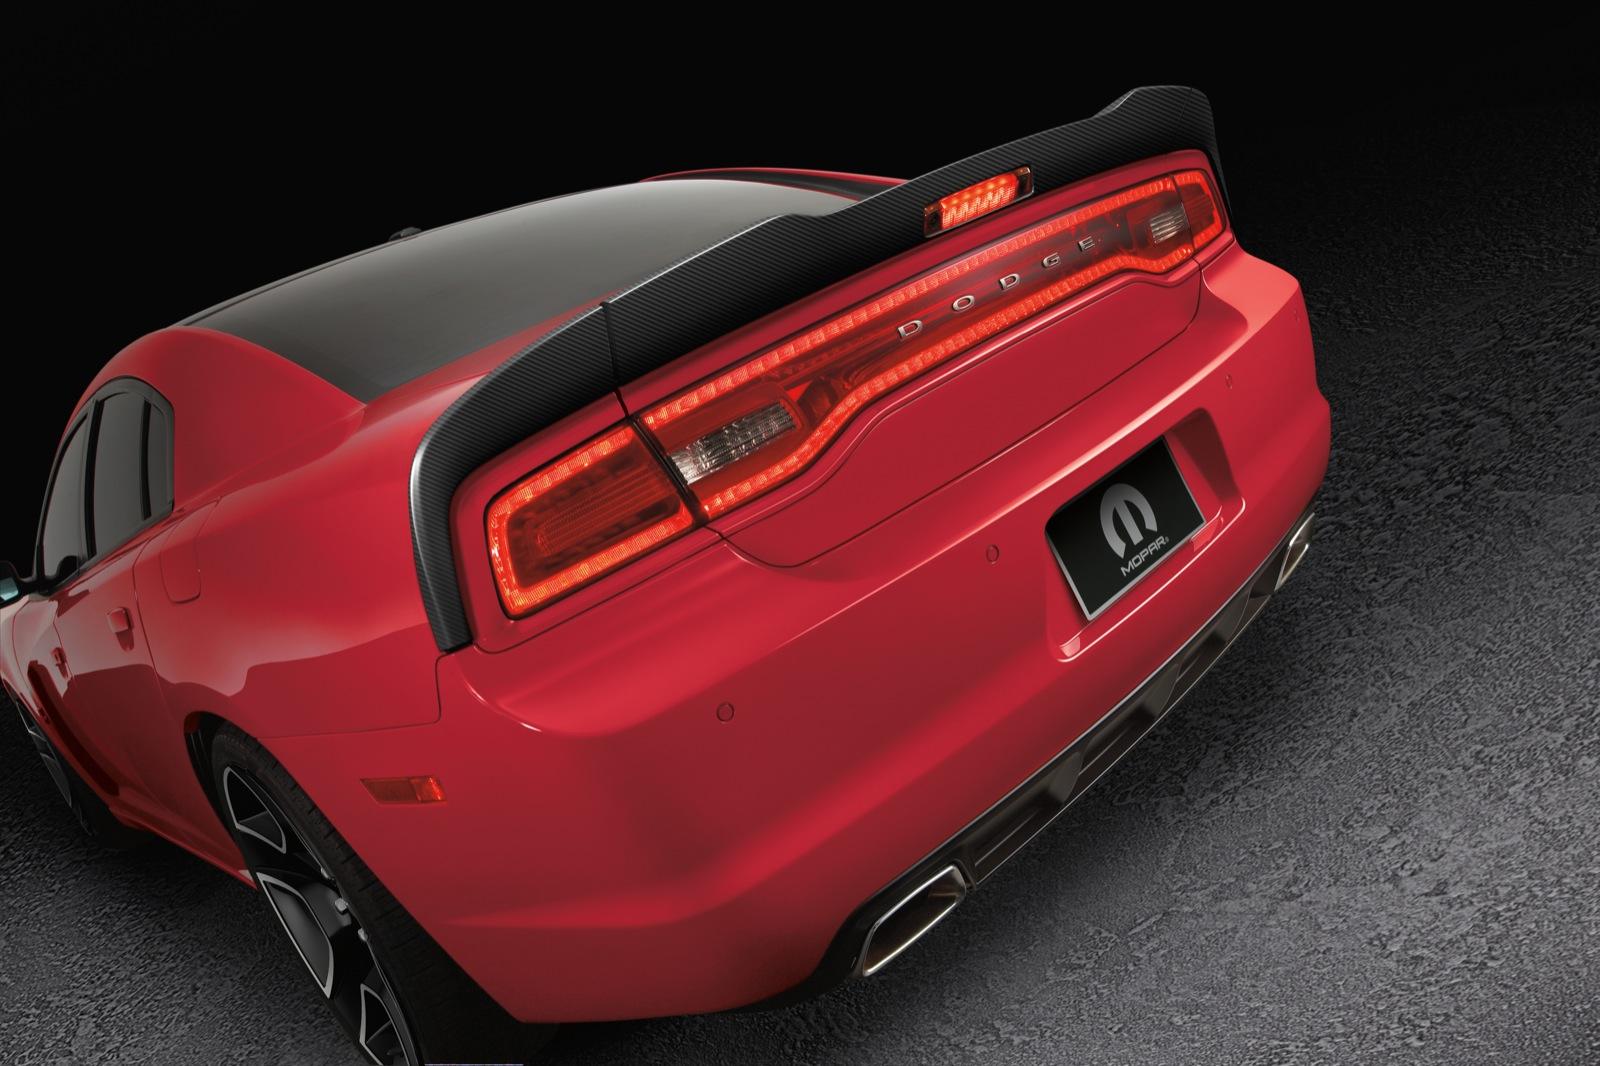 Dodge dodge charger with wing : 2012 Dodge Charger Redline: Mopar Performance Outpowers SRT?